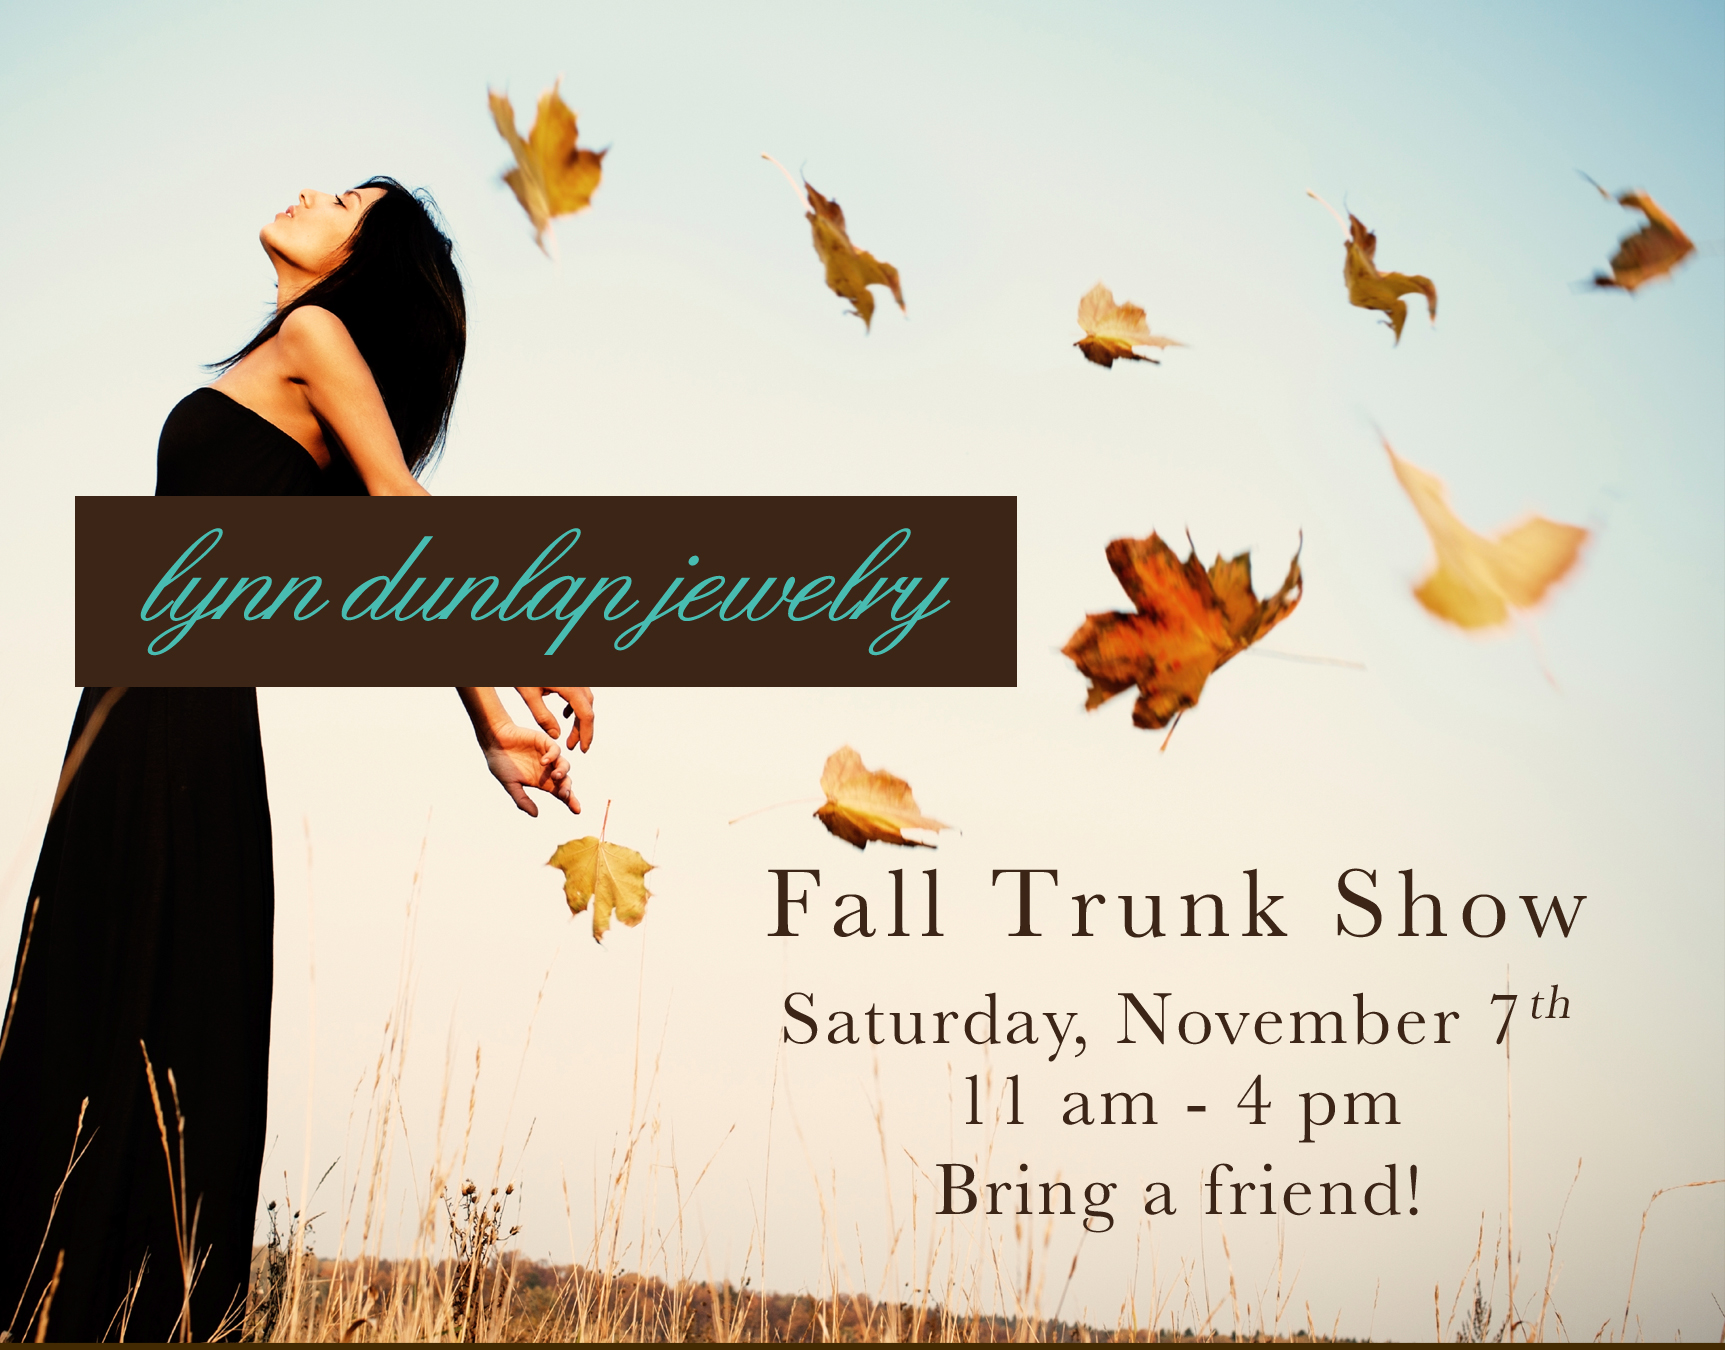 Lynn Dunlap Jewelry | Invitation